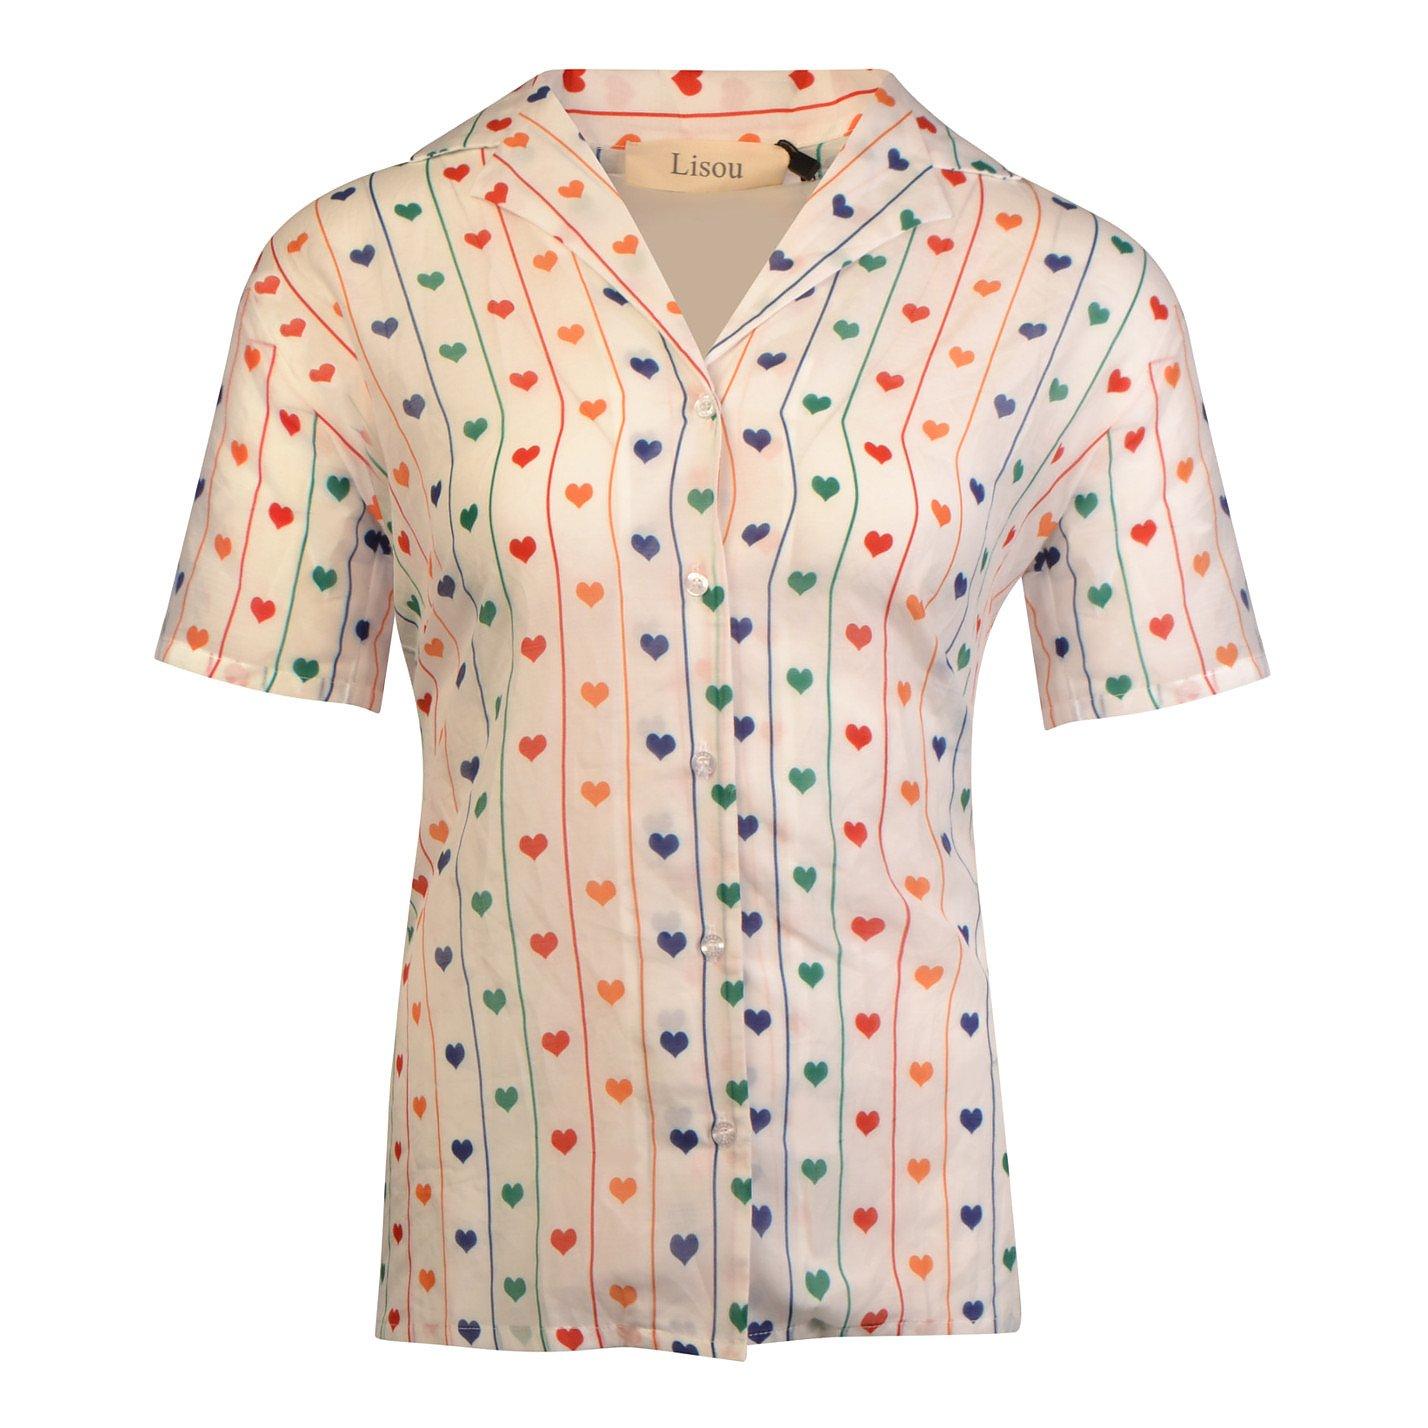 Lisou Victoire Rainbow Hearts Cotton Shirt